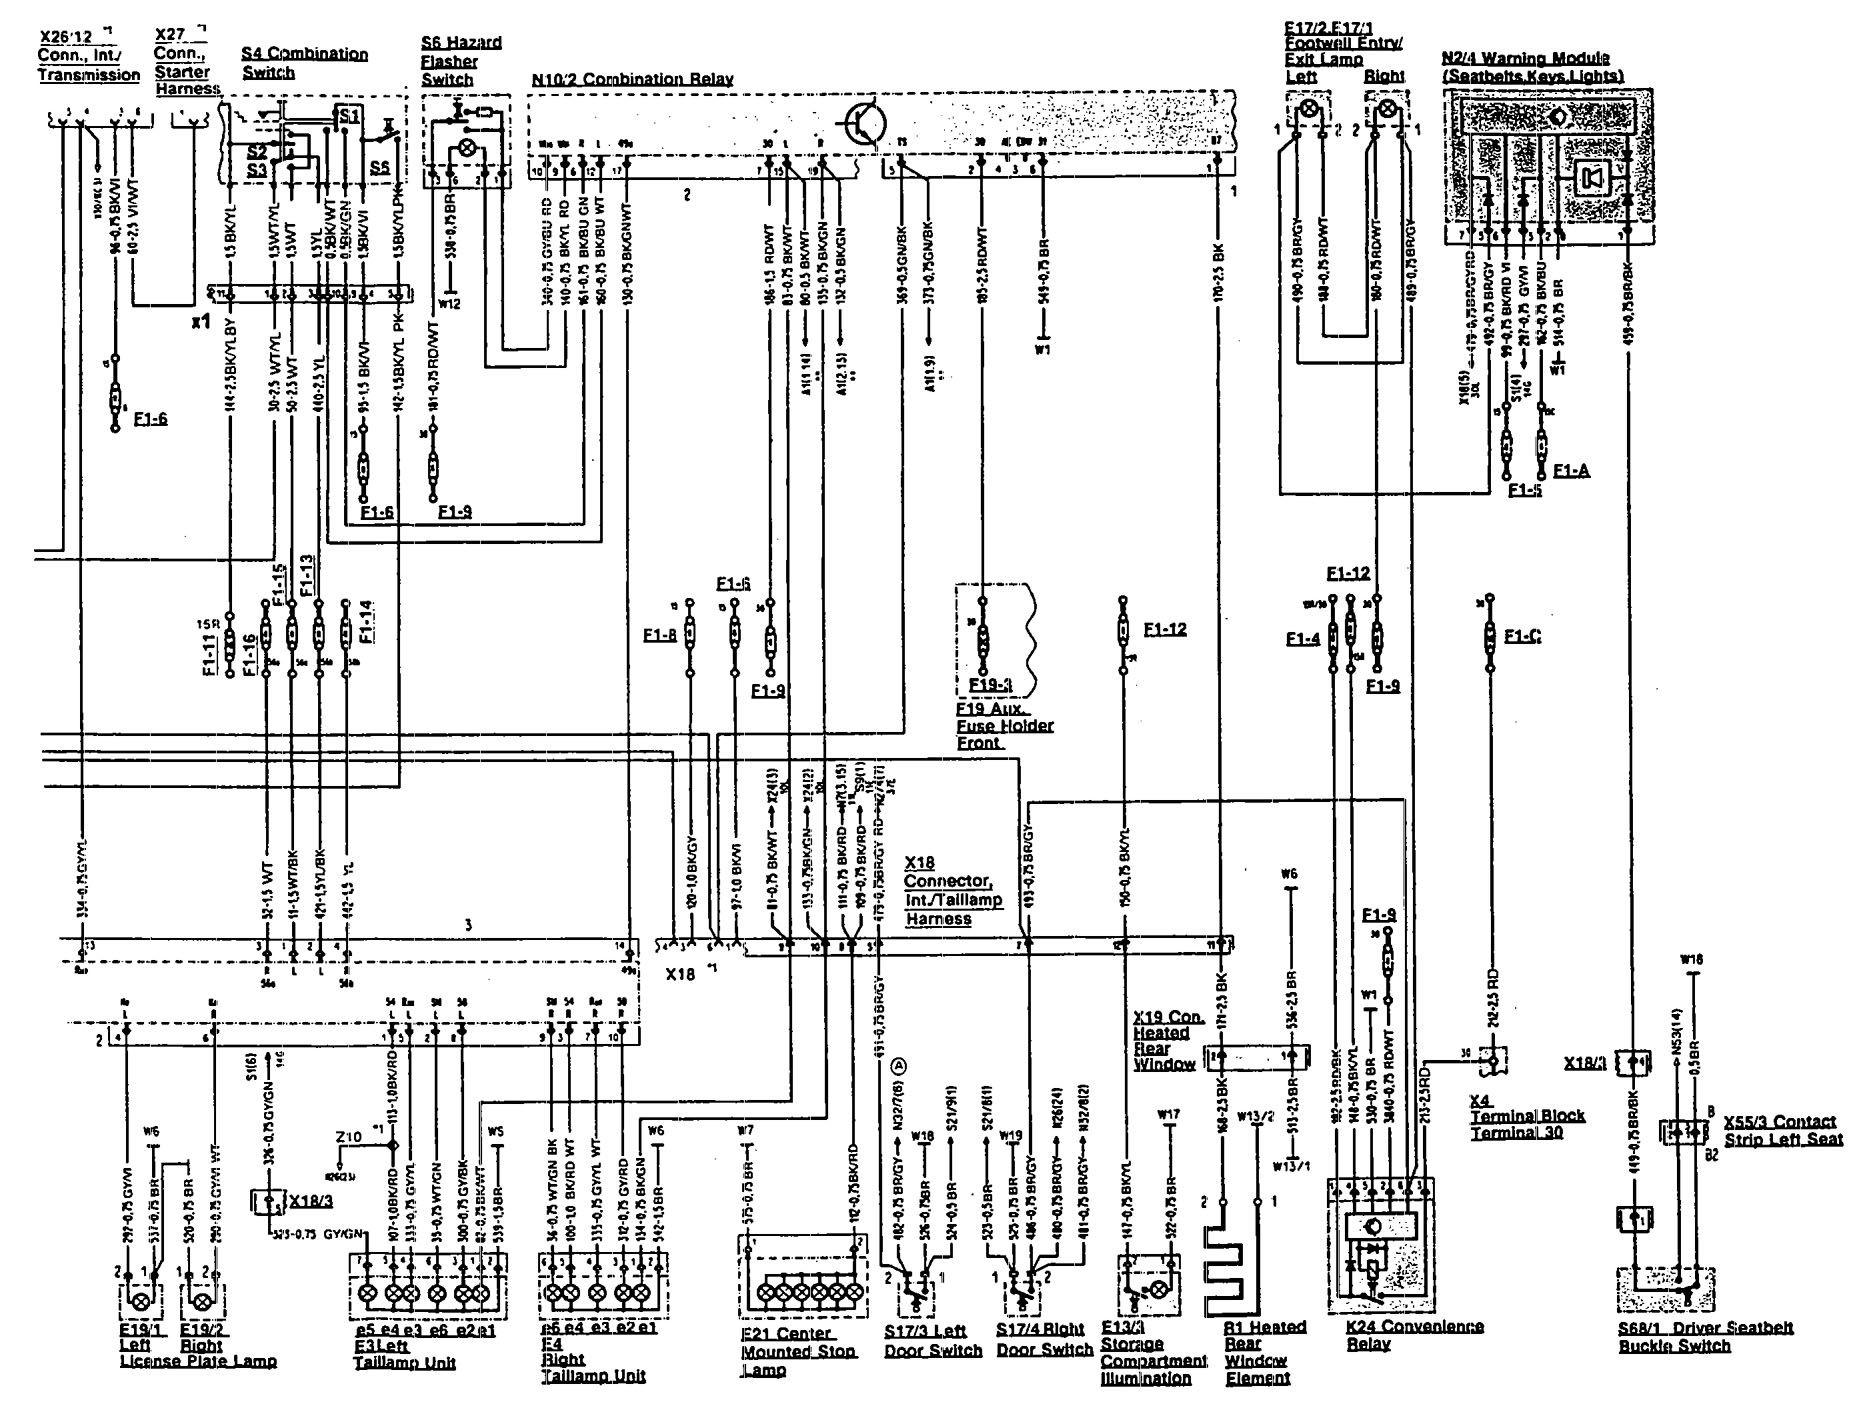 domestic wiring diagrams lighting 7 pin trailer connector hopkins diagram new blade mercedes benz 500sl 1993 interior